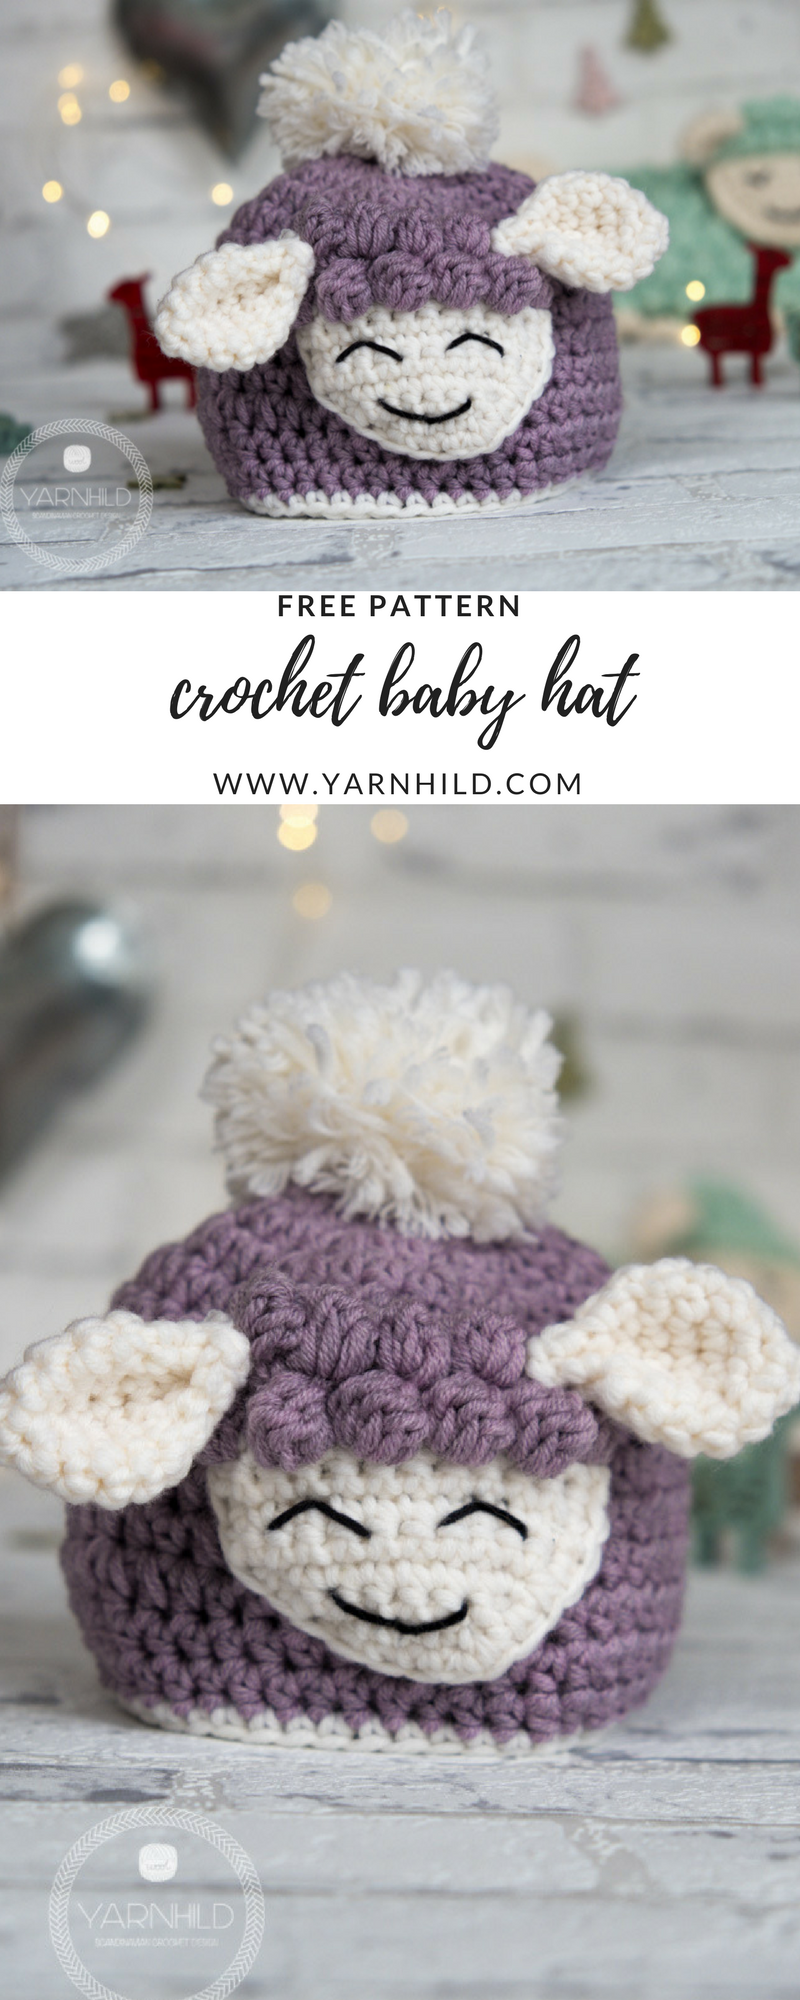 Crochet Baby Hat - Sverre the Lamb. Free pattern on yarnhild.com ...